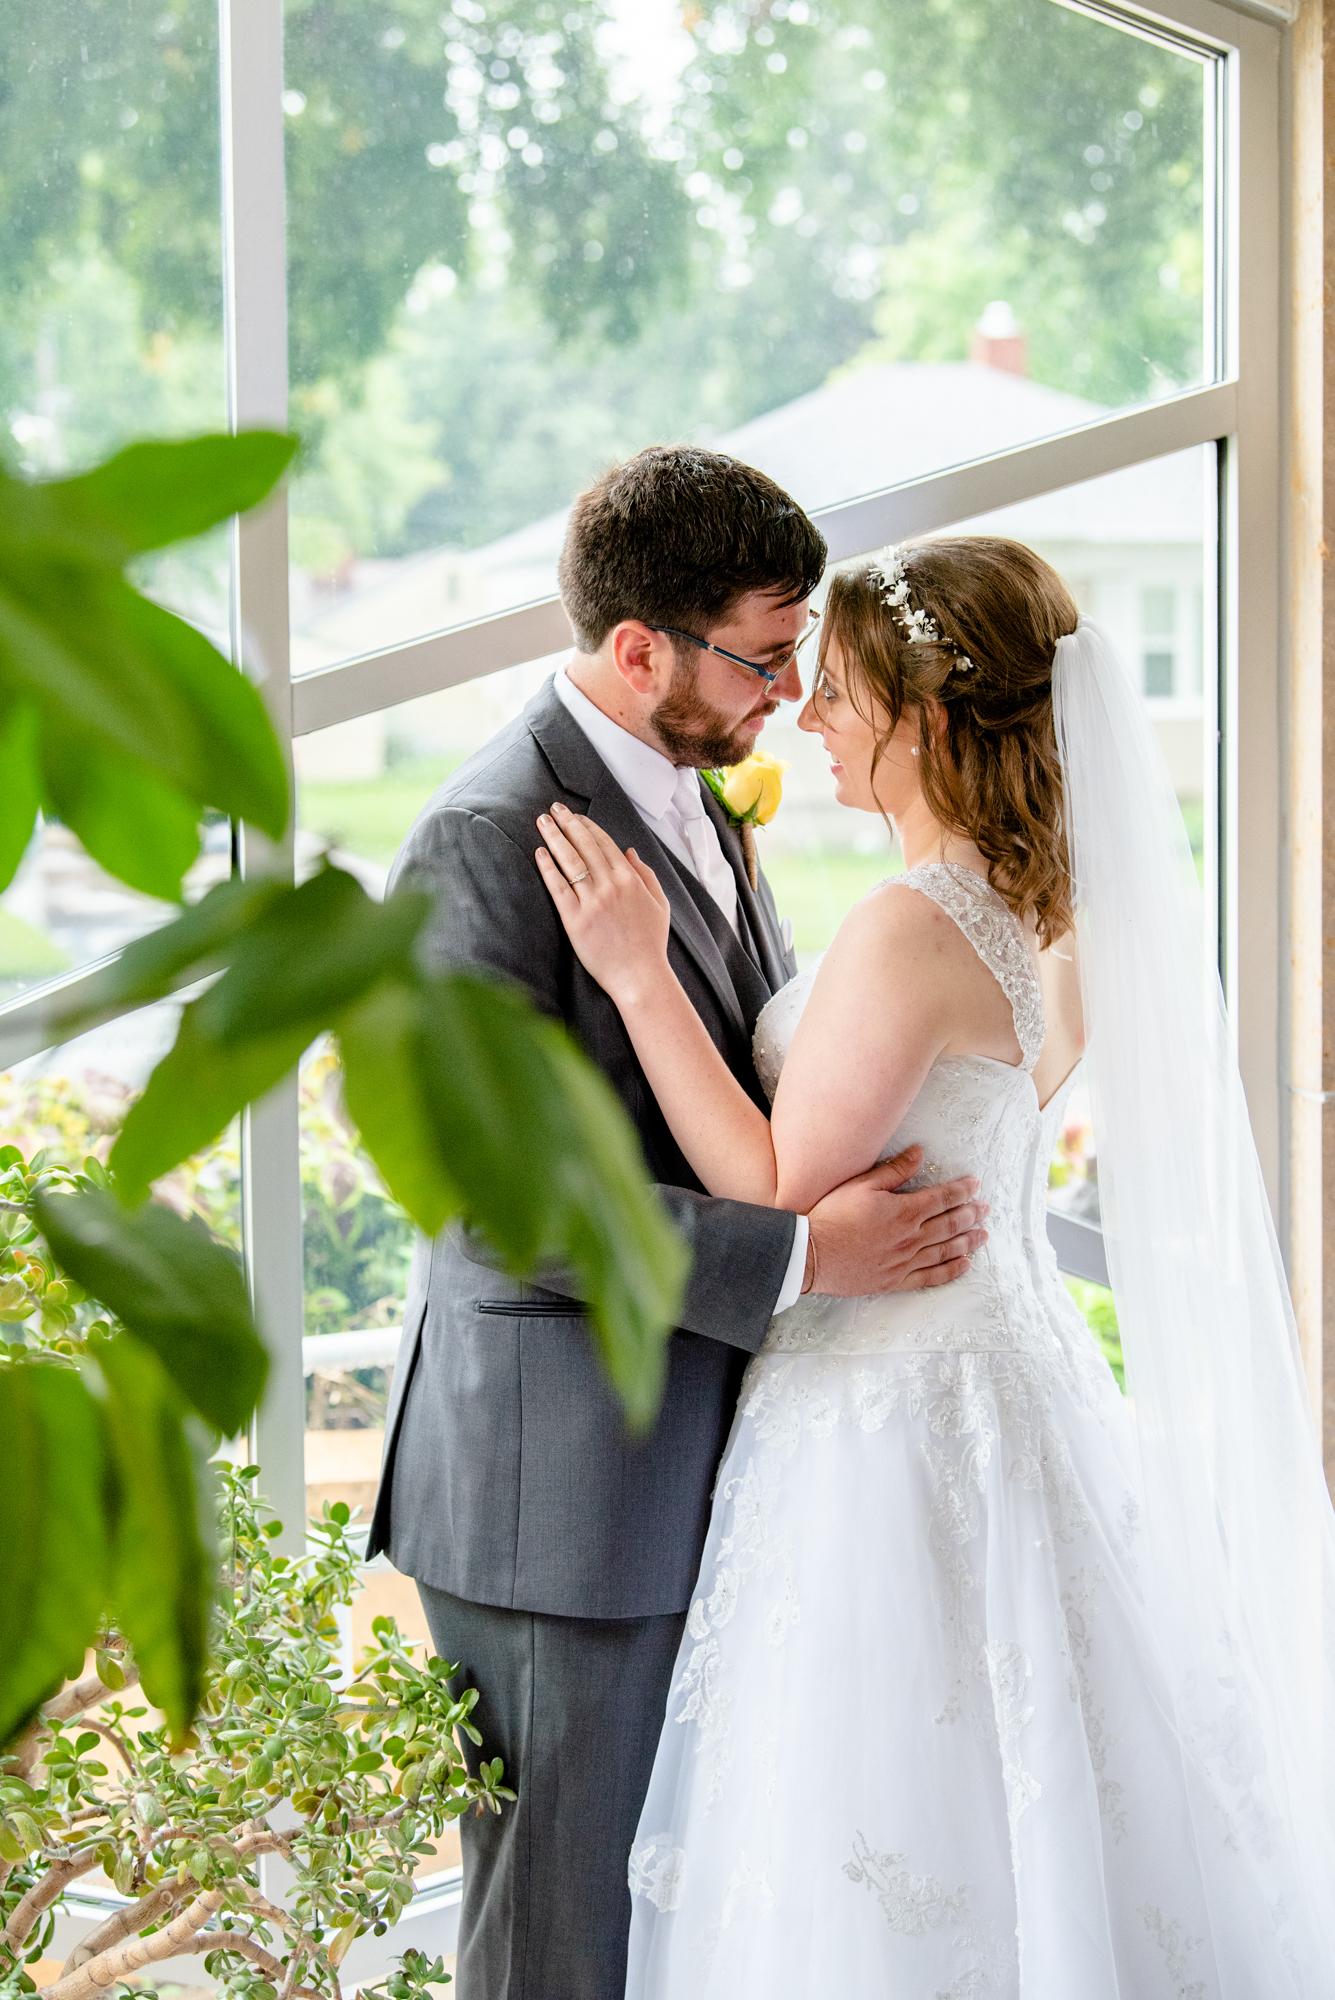 DSC 7751 - Emma and Chris | Fargo Wedding